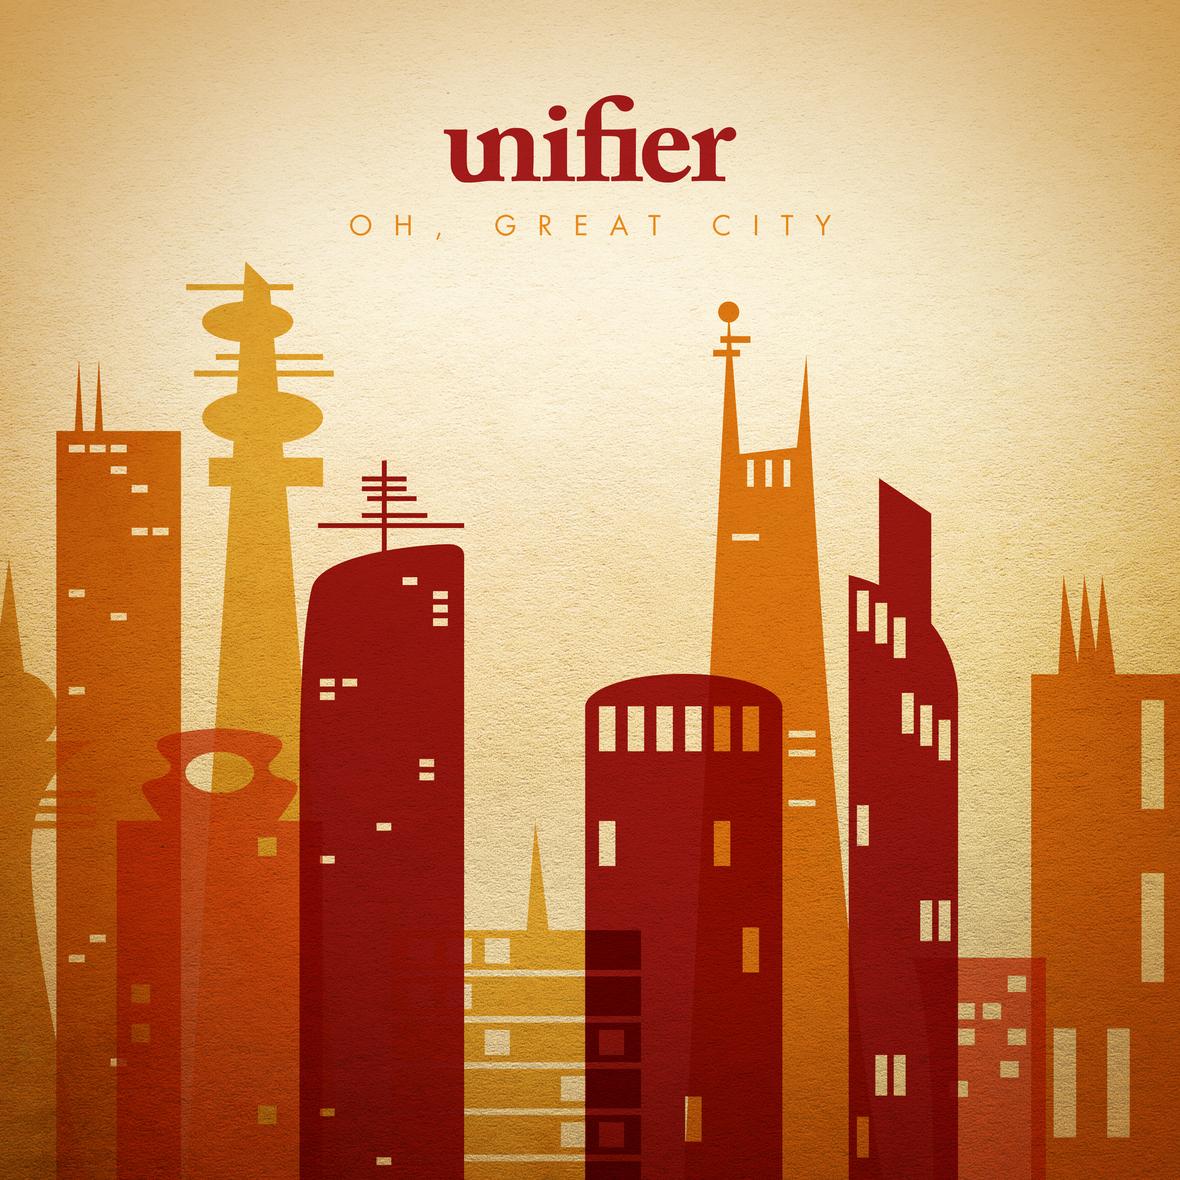 unifier oh great city art